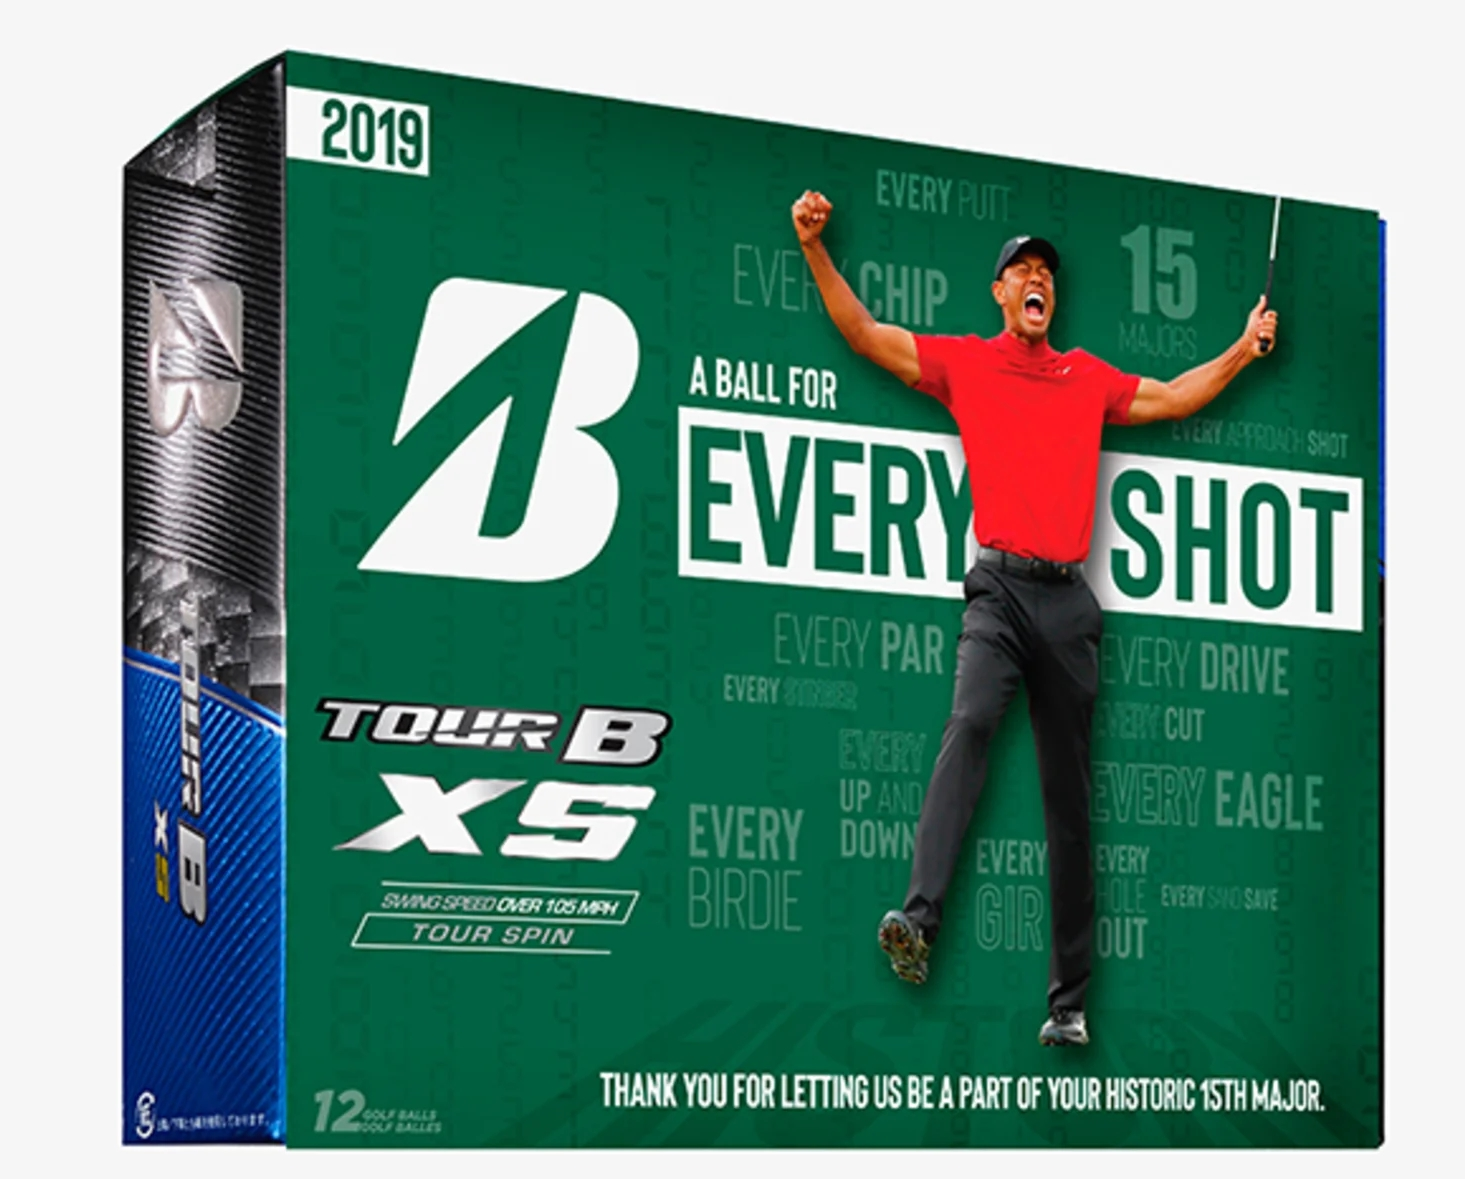 Tiger Woods Limited Edition Masters Commemorative Bridgestone Tour B XS Golf Balls thumbnail